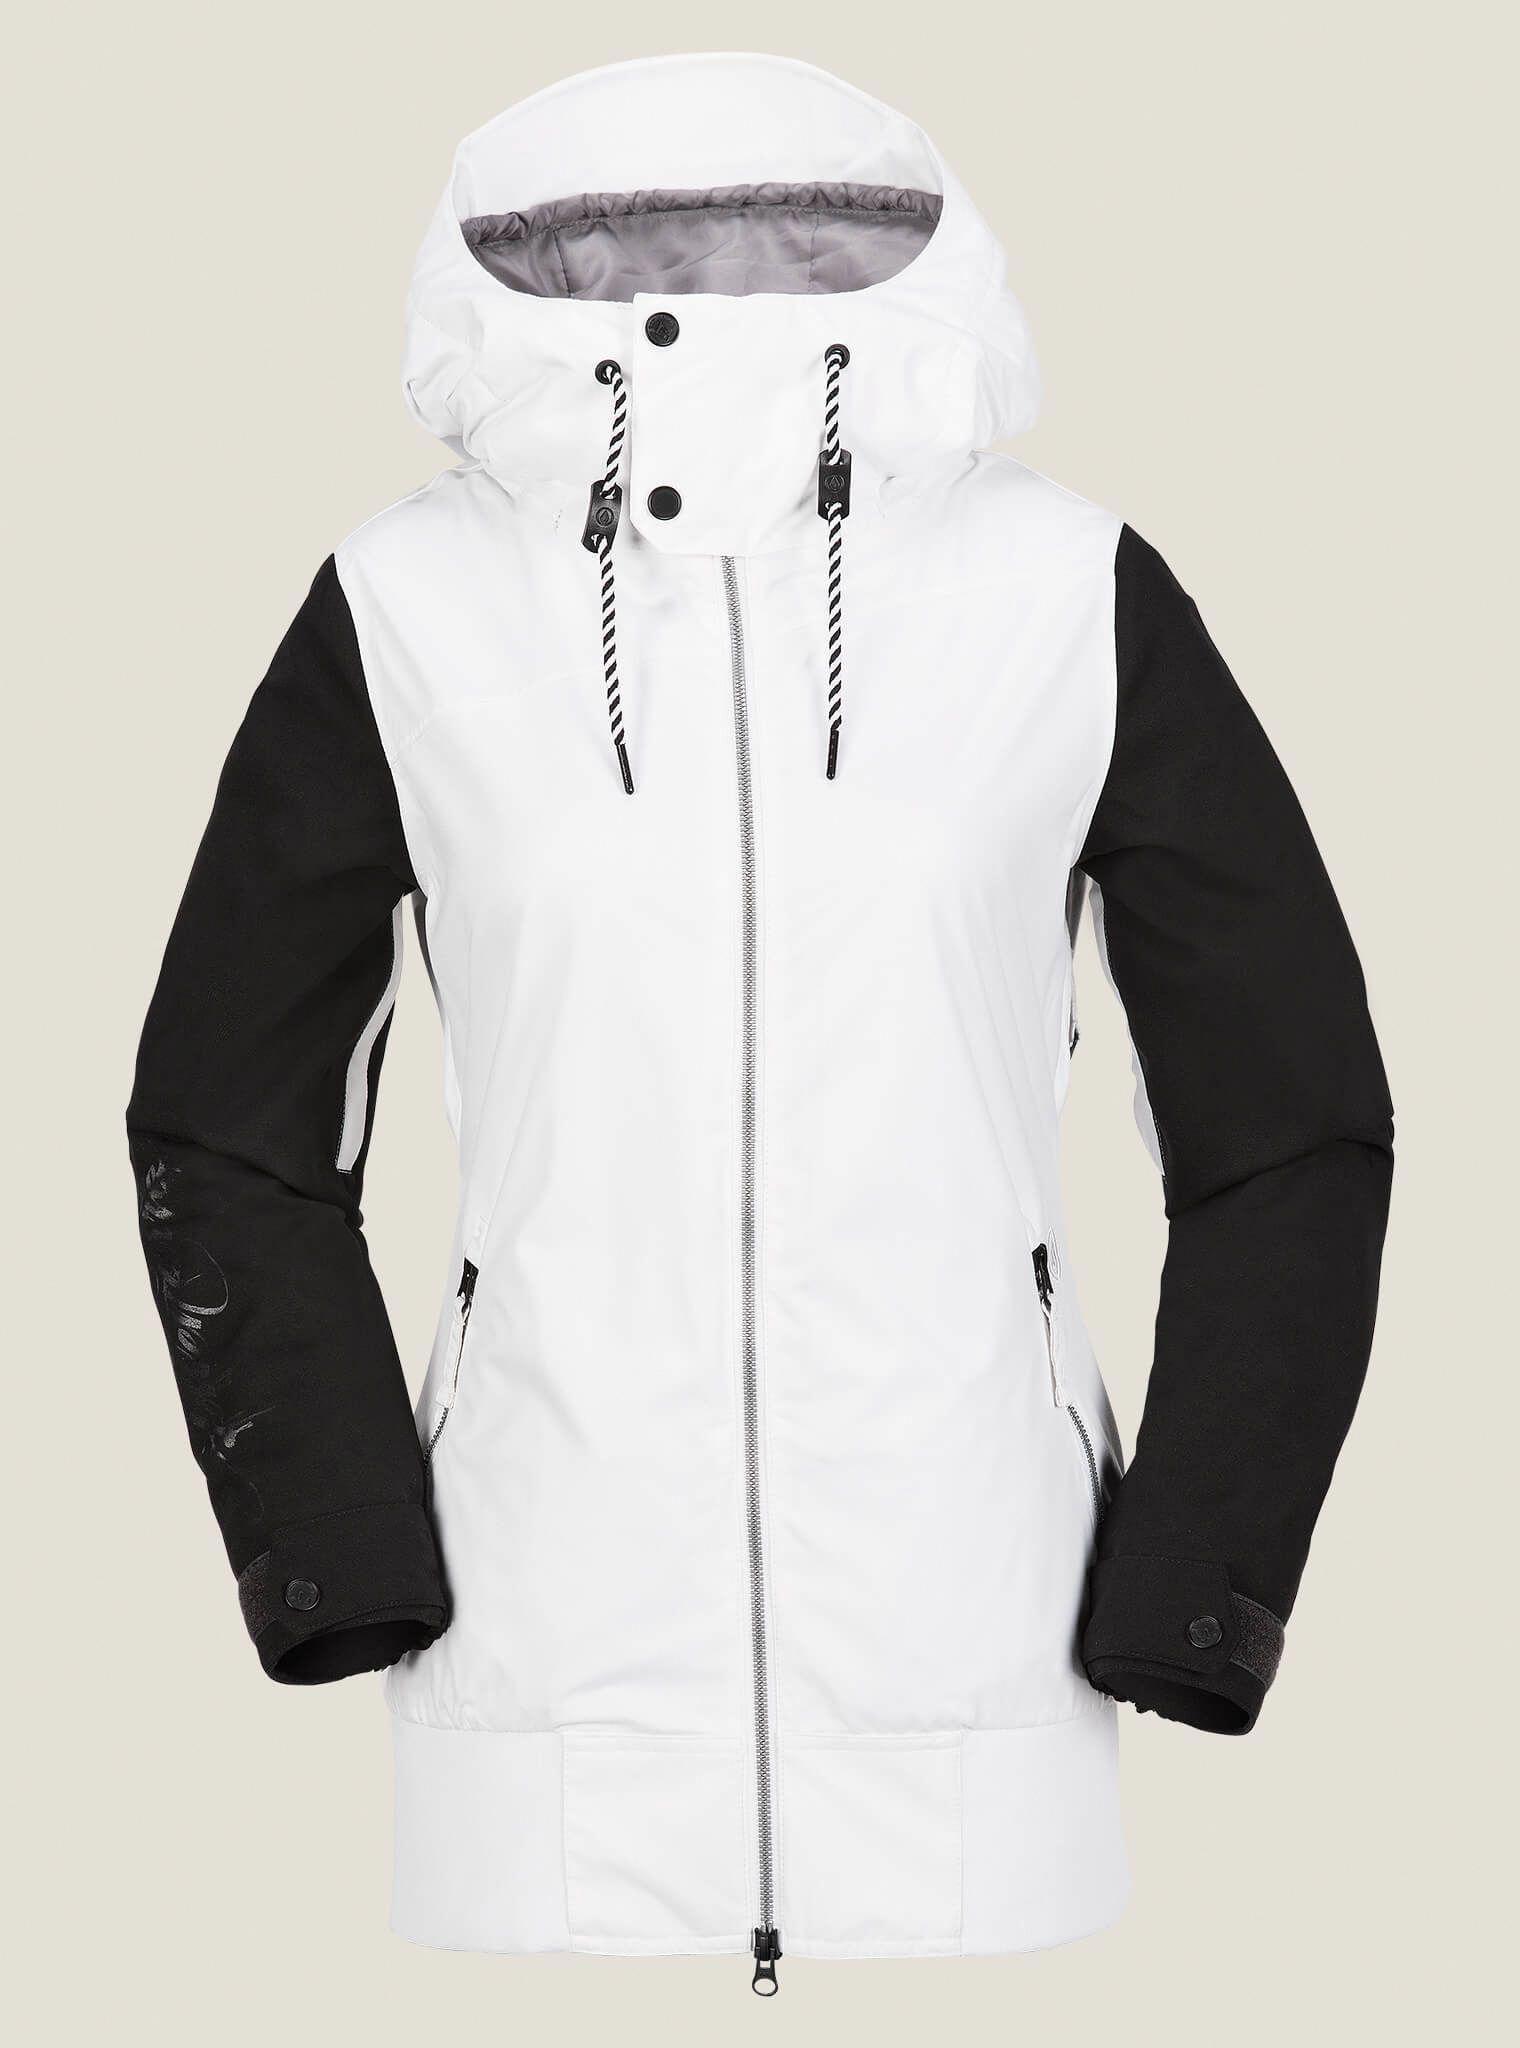 39796e9eb58 Stave Jacket - Volcom Womens #snowboard Jackets | Volcom ...